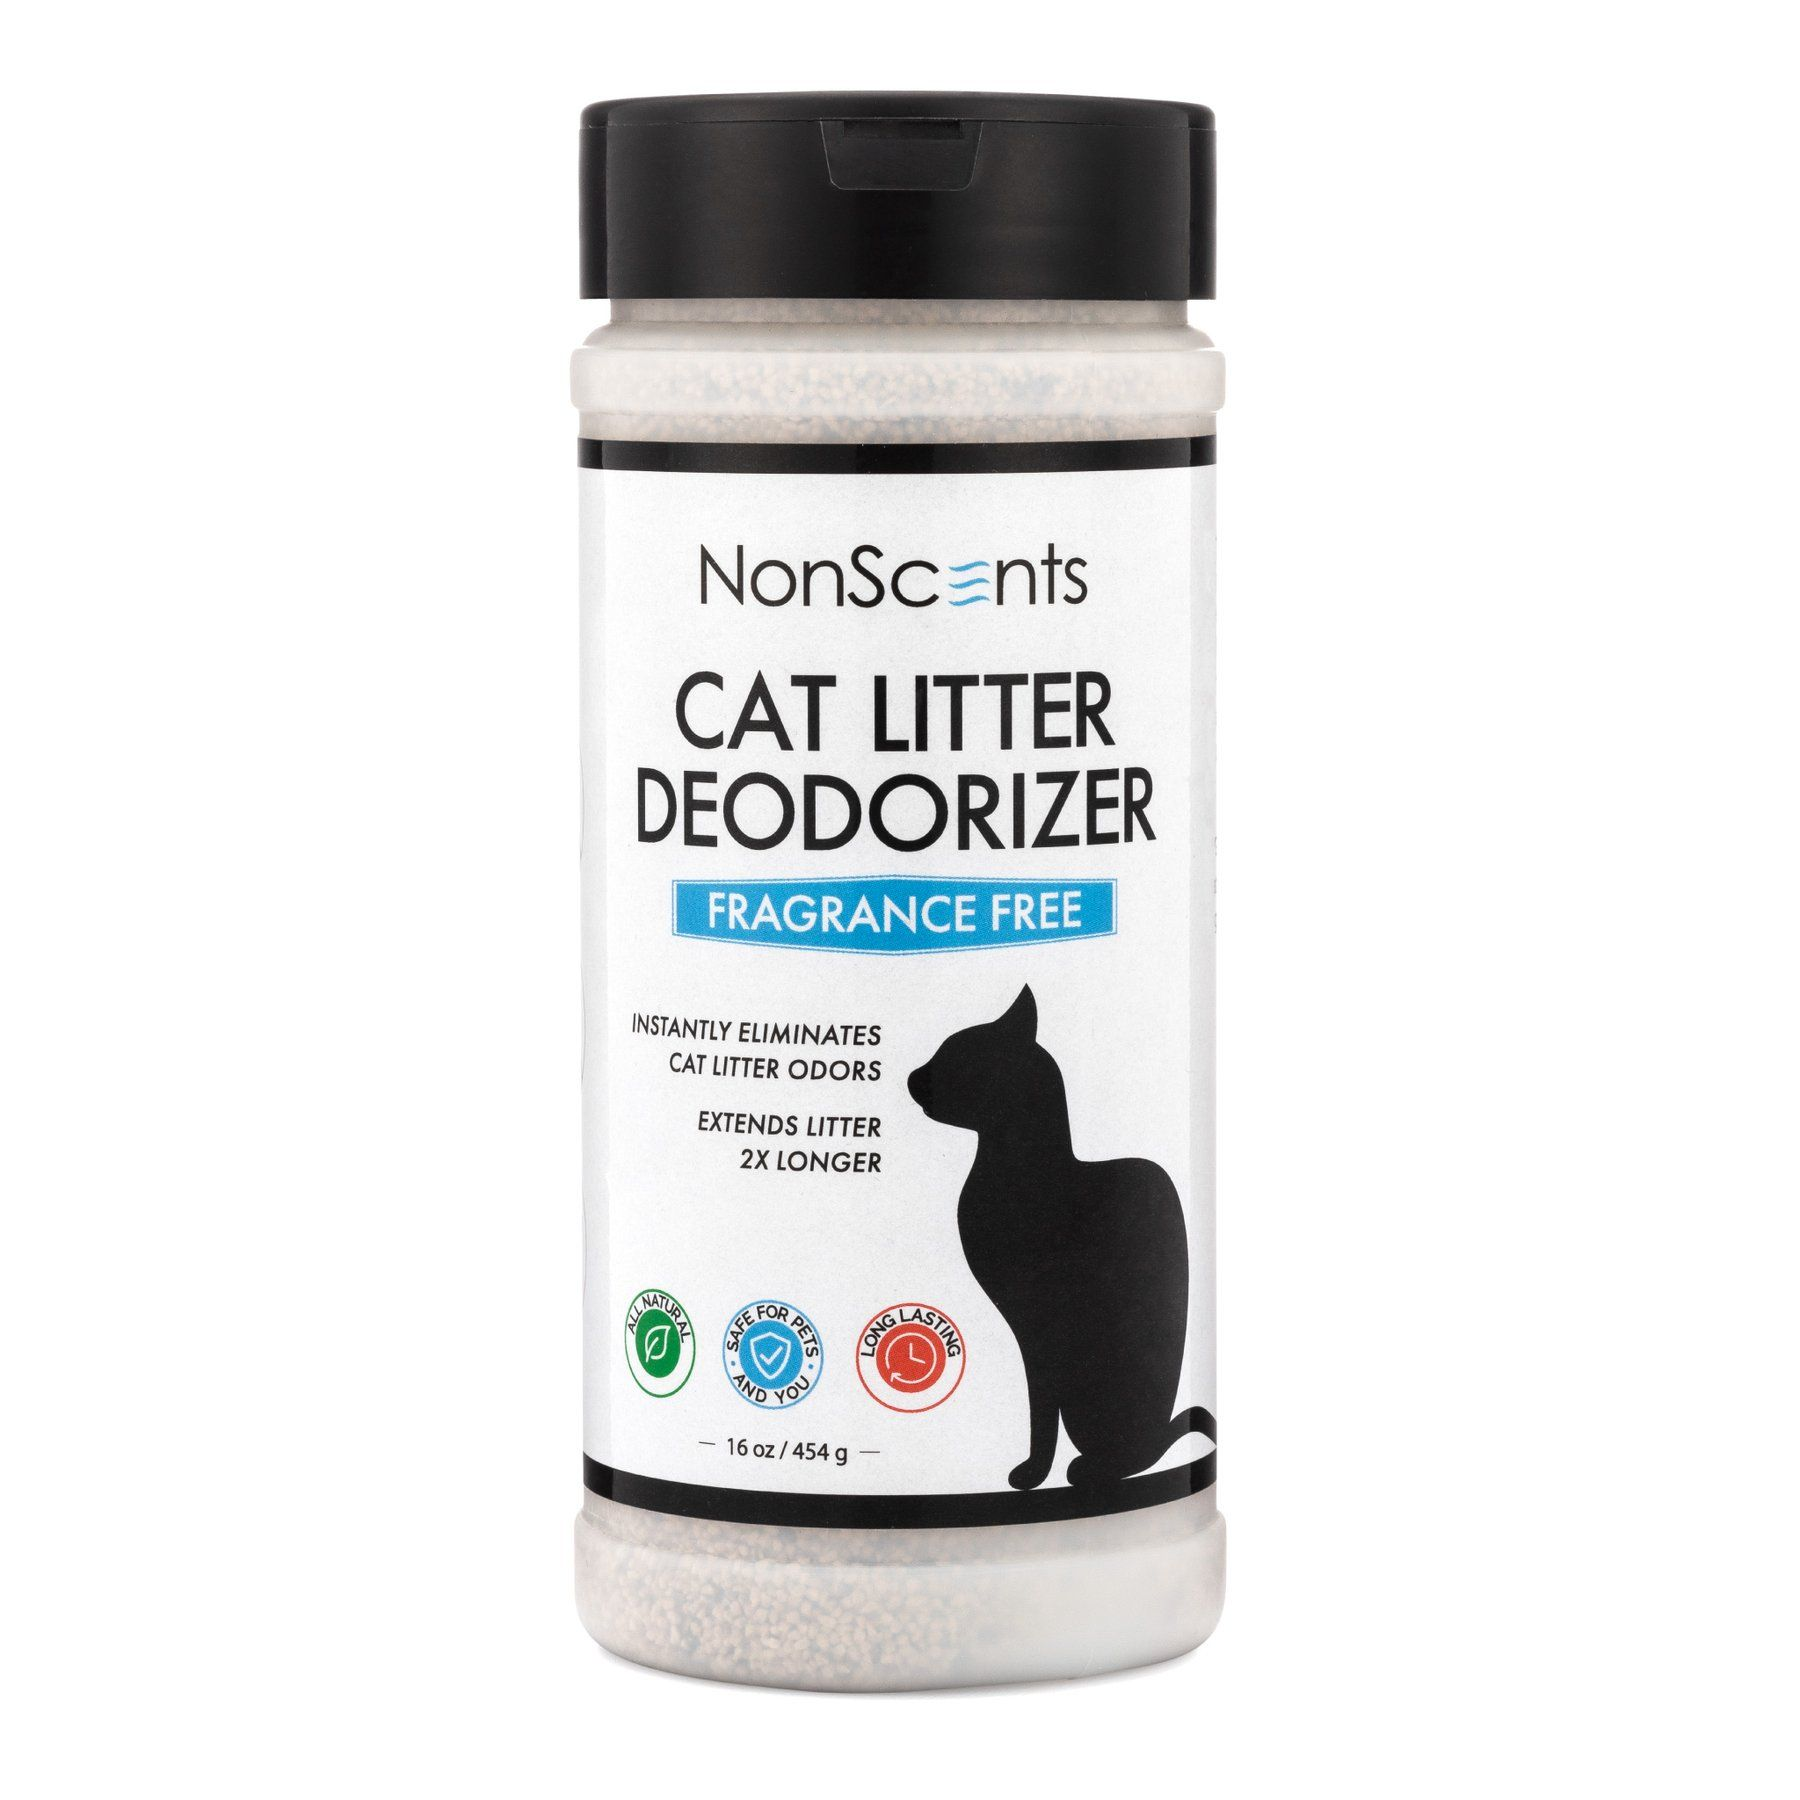 Cat litter deodorizer in 2020 cat litter fragrance free